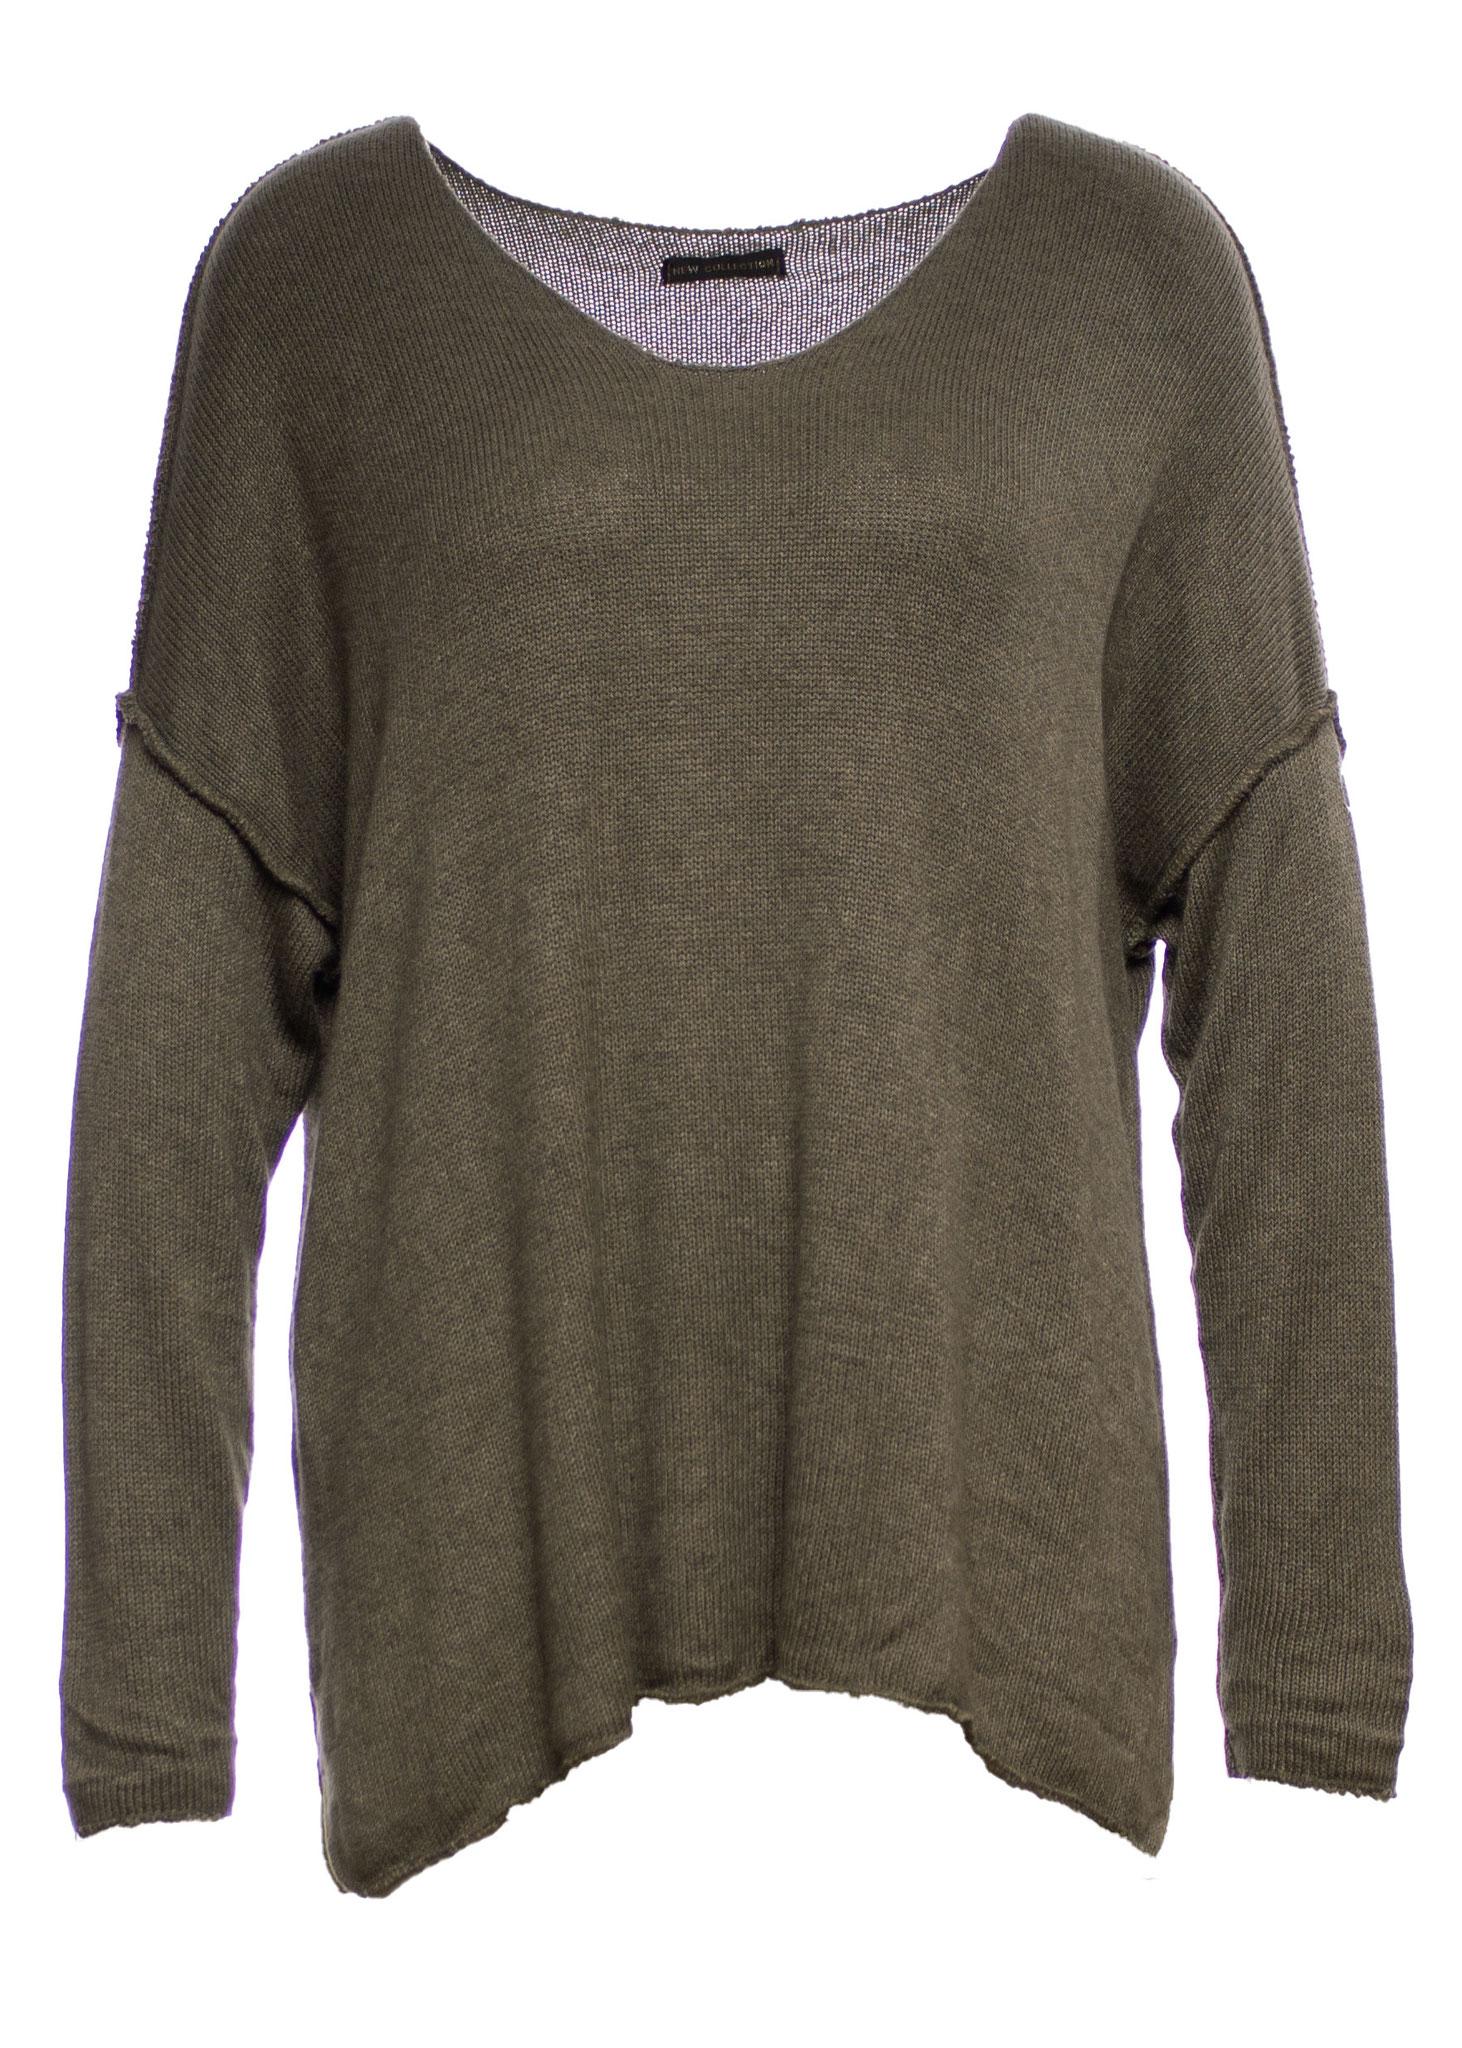 Strickshirt 24,99€